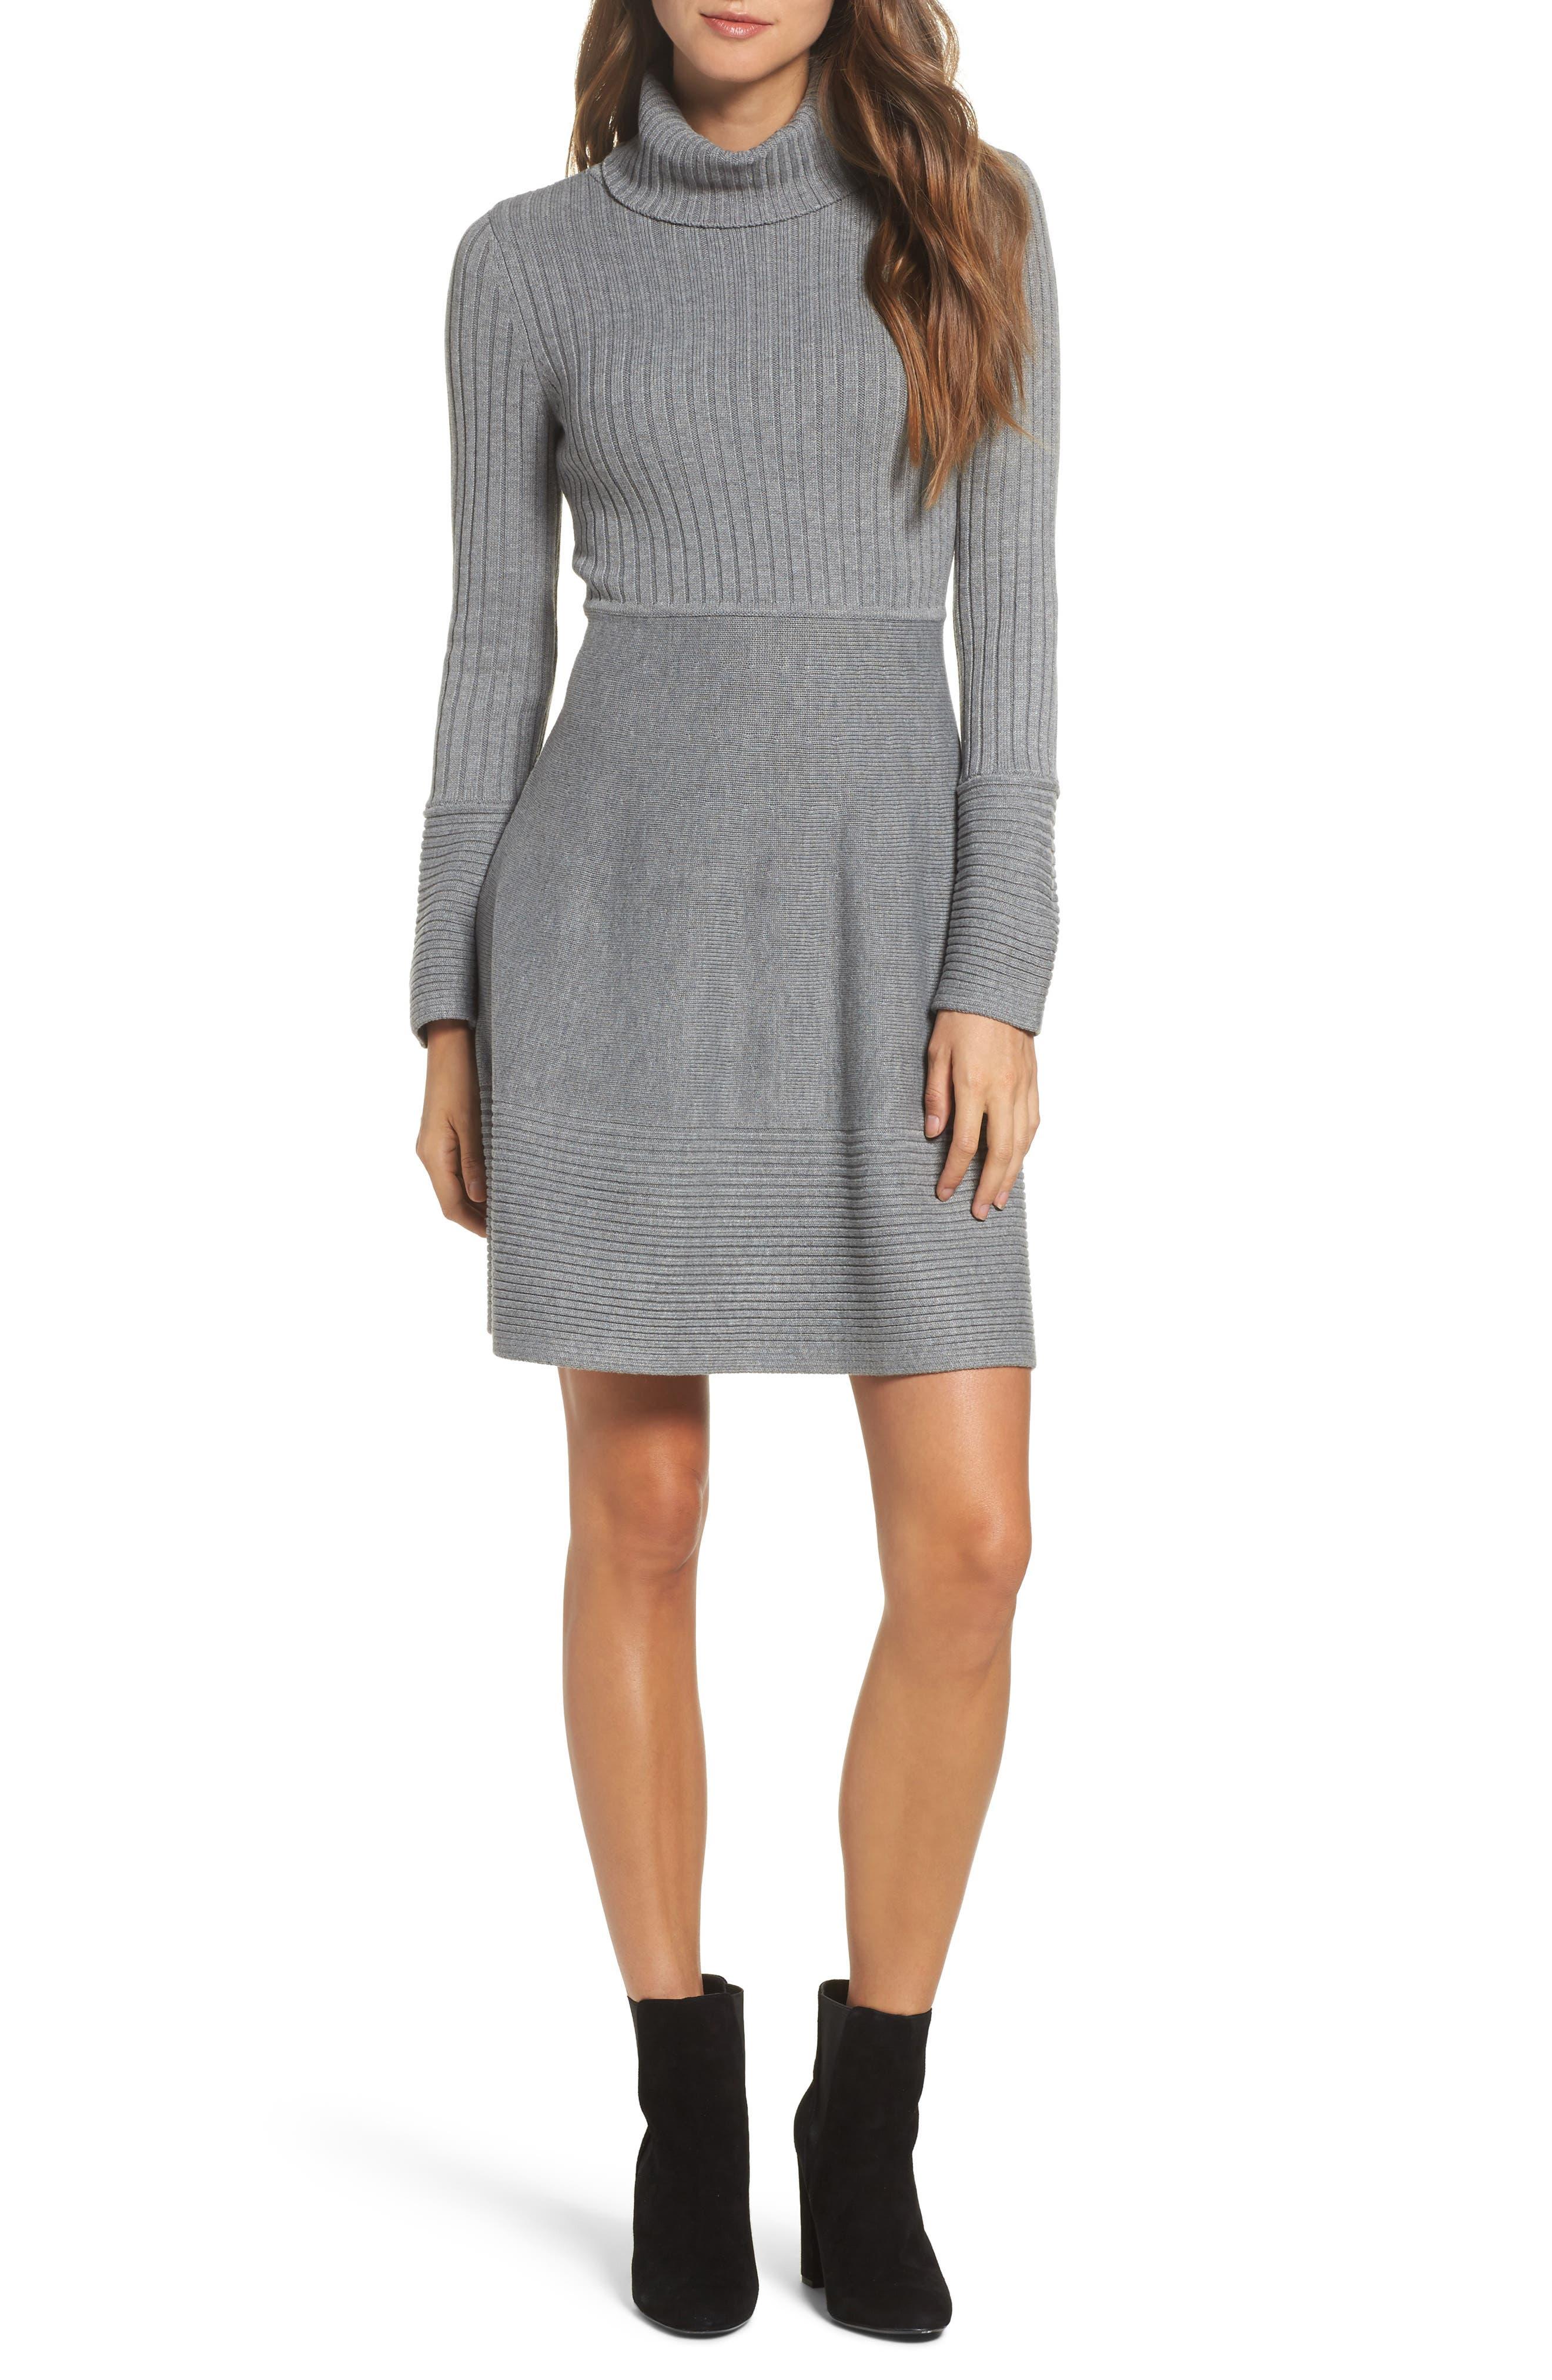 ELIZA J, Turtleneck Sweater Dress, Main thumbnail 1, color, GREY